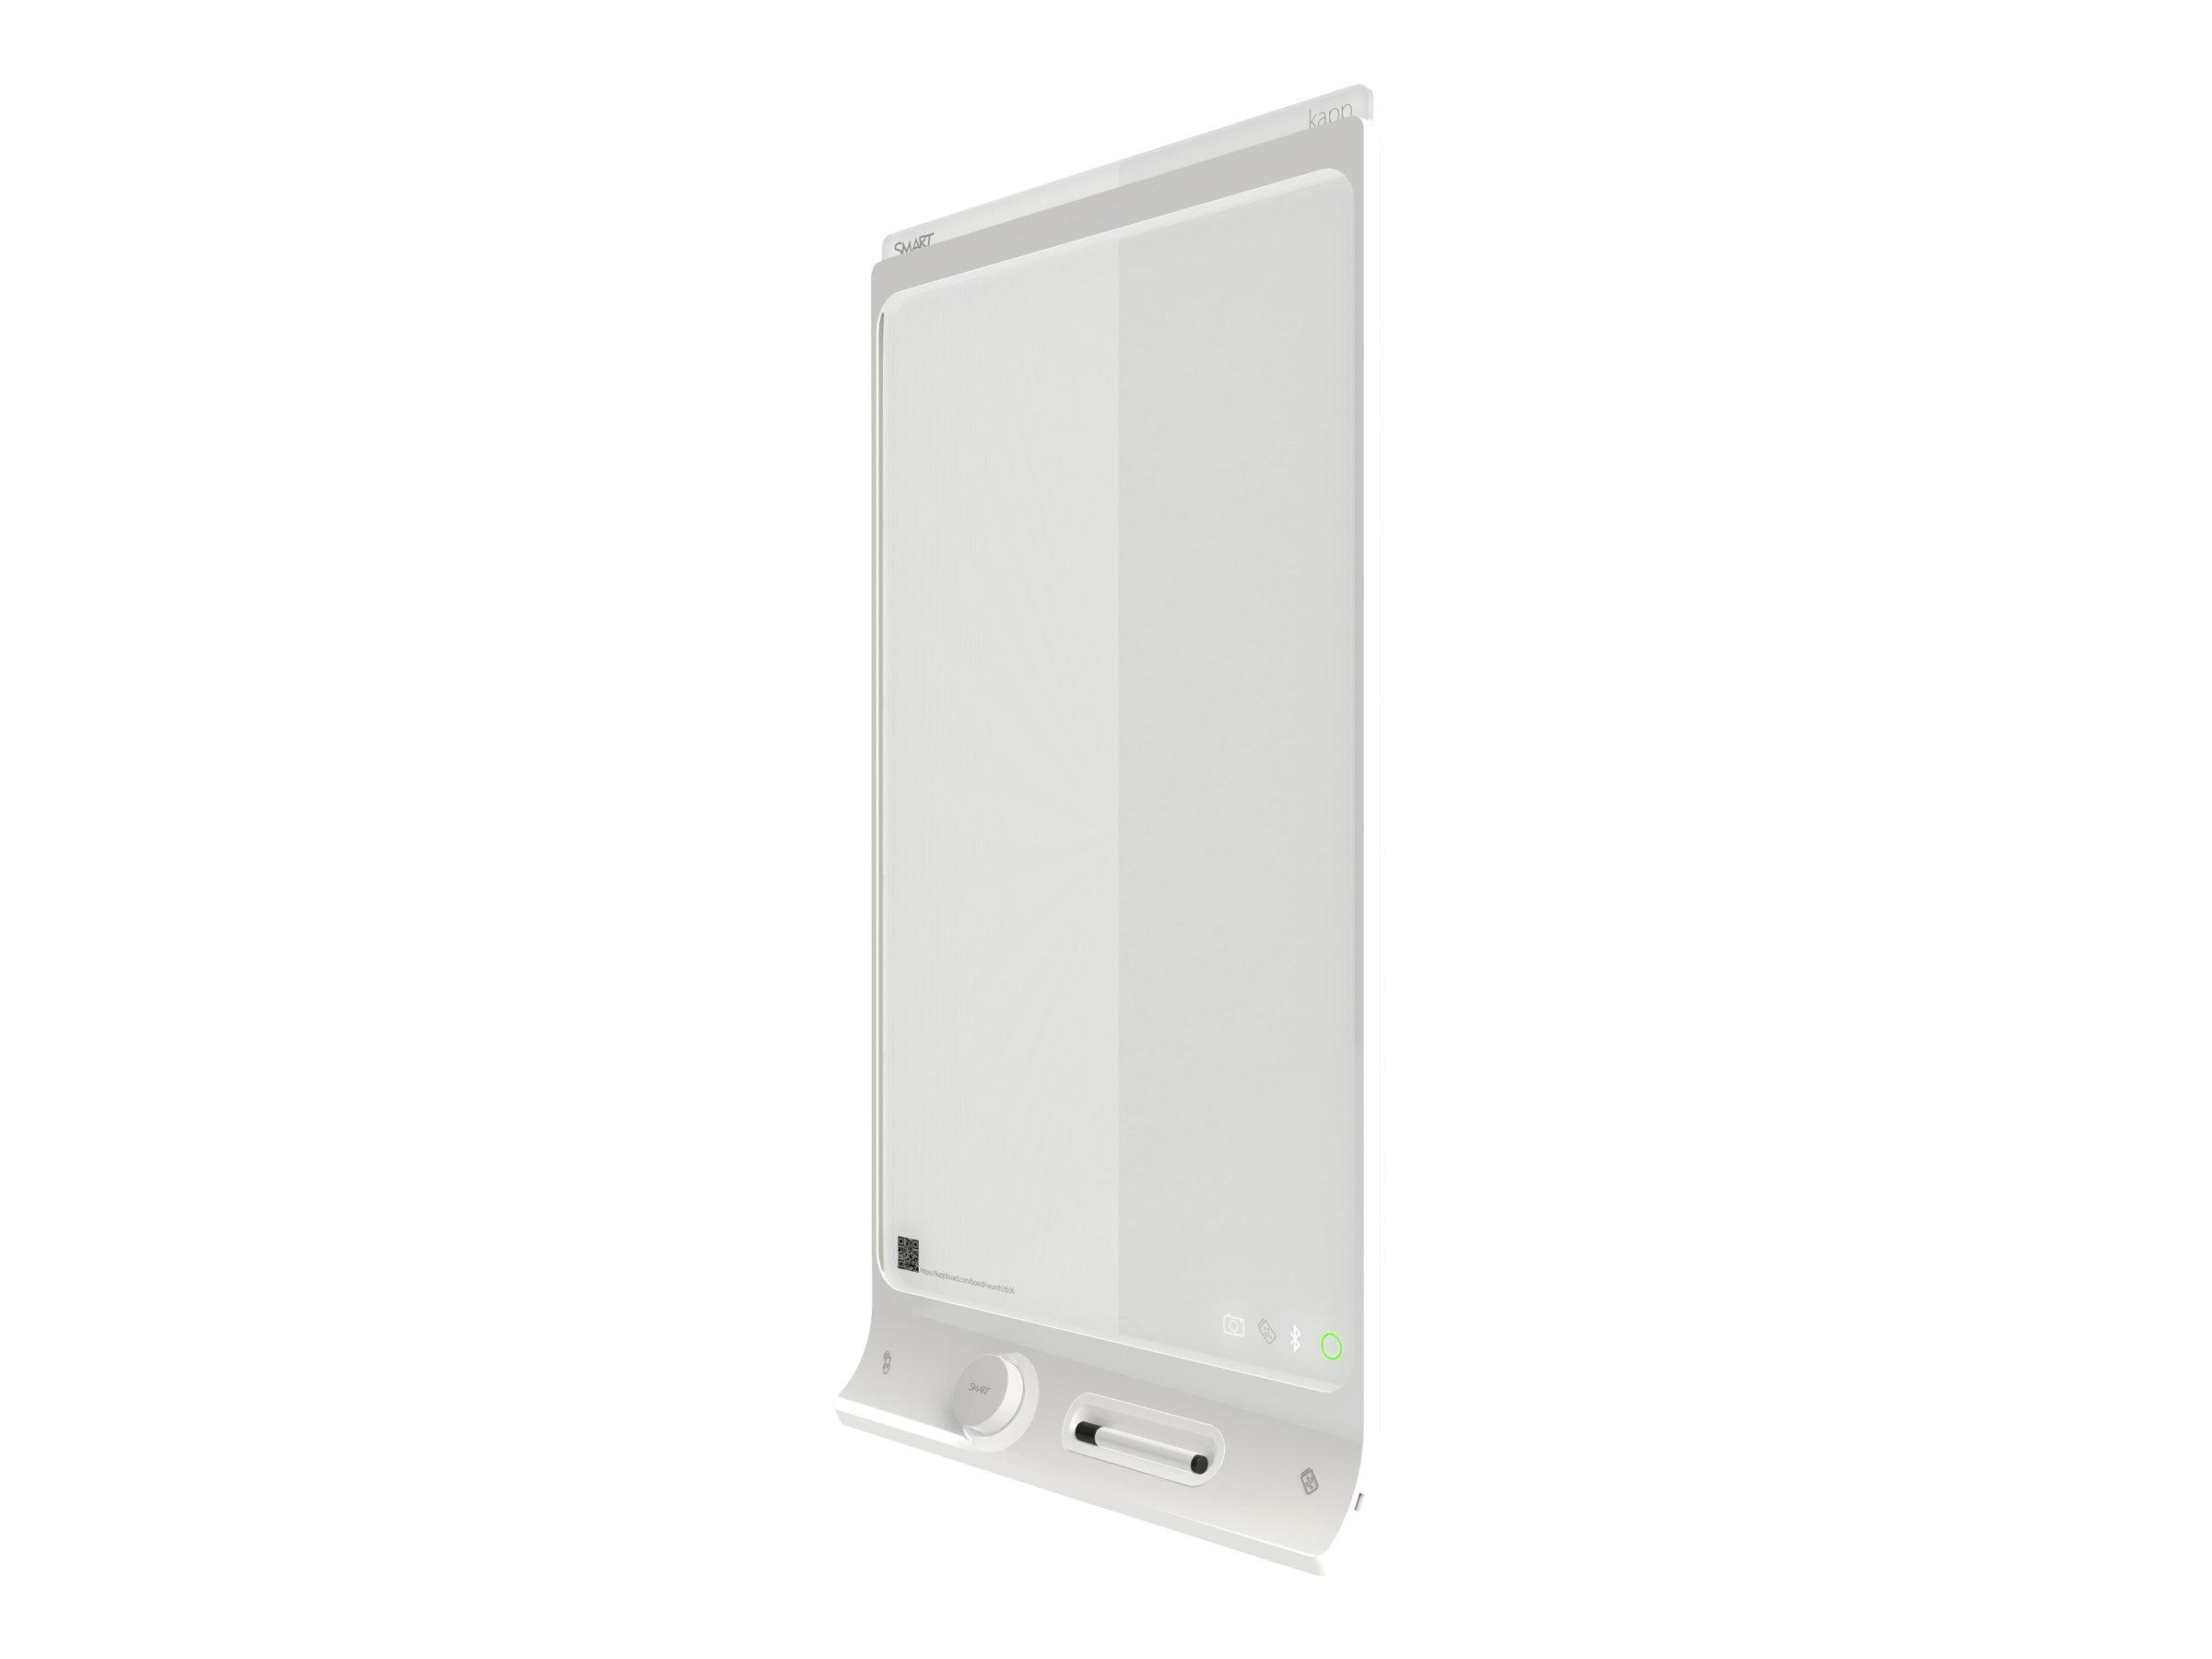 SMART kapp 42 - Interaktives Whiteboard - 106.7 cm (42